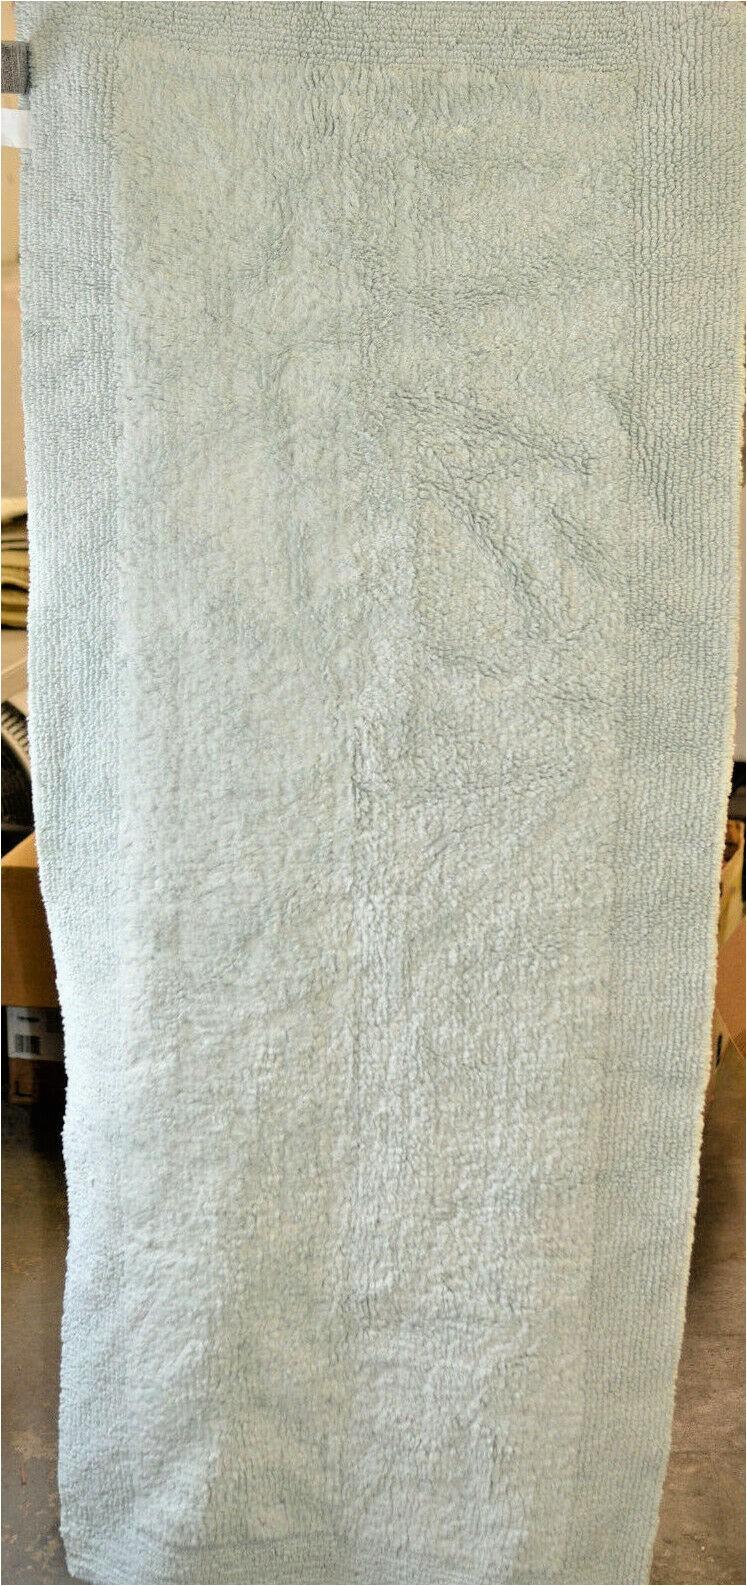 "Wamsutta Reversible Cotton Bath Rugs Wamsutta Ultra Fine Reversible 24"" X 60"" Bath Rug In Seafoam"